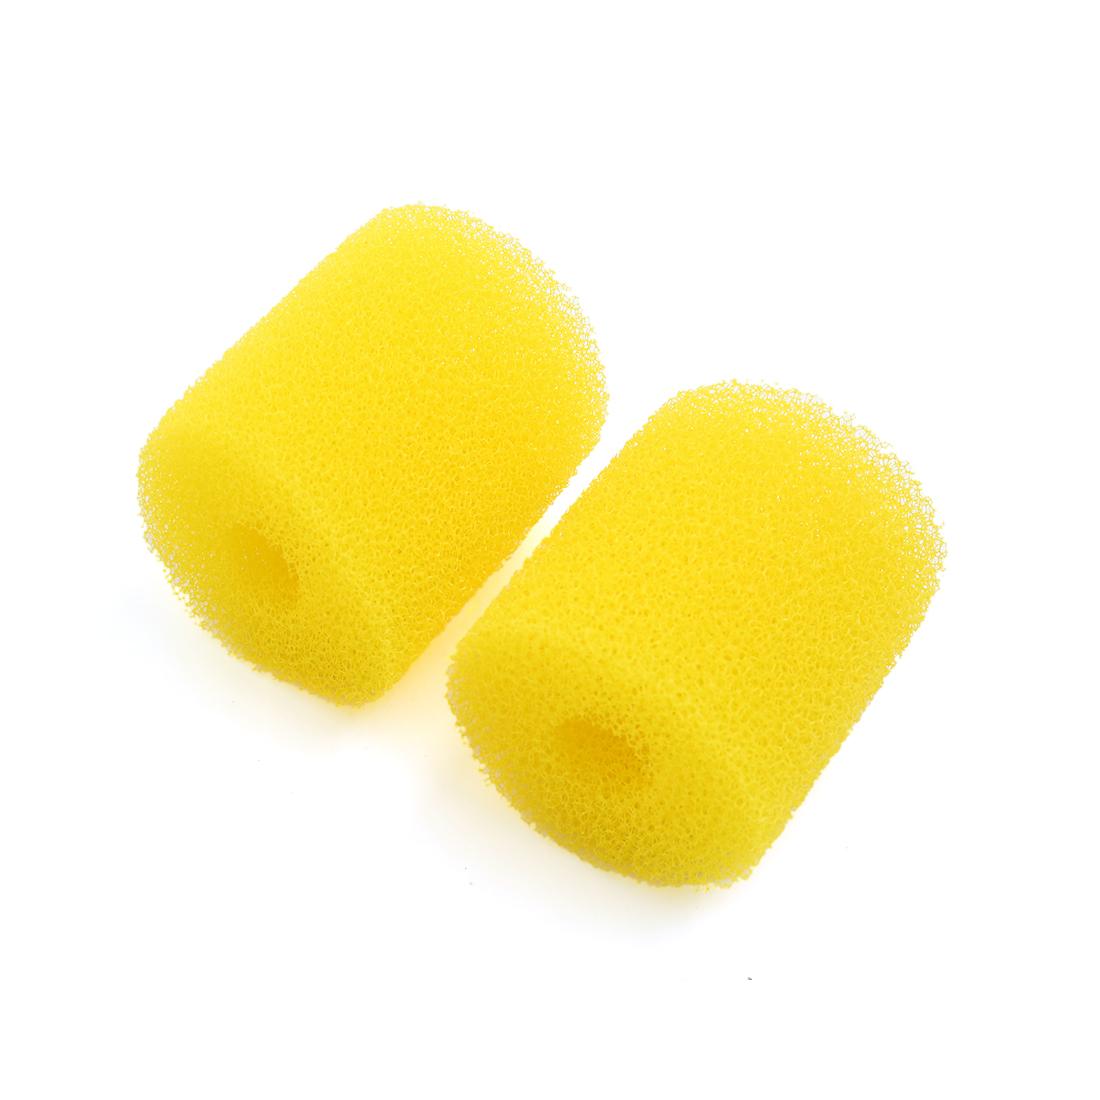 2pcs Yellow 2.6 Inch Dia Cylinder Pre-Filter Sponge Filter Media for Aquarium